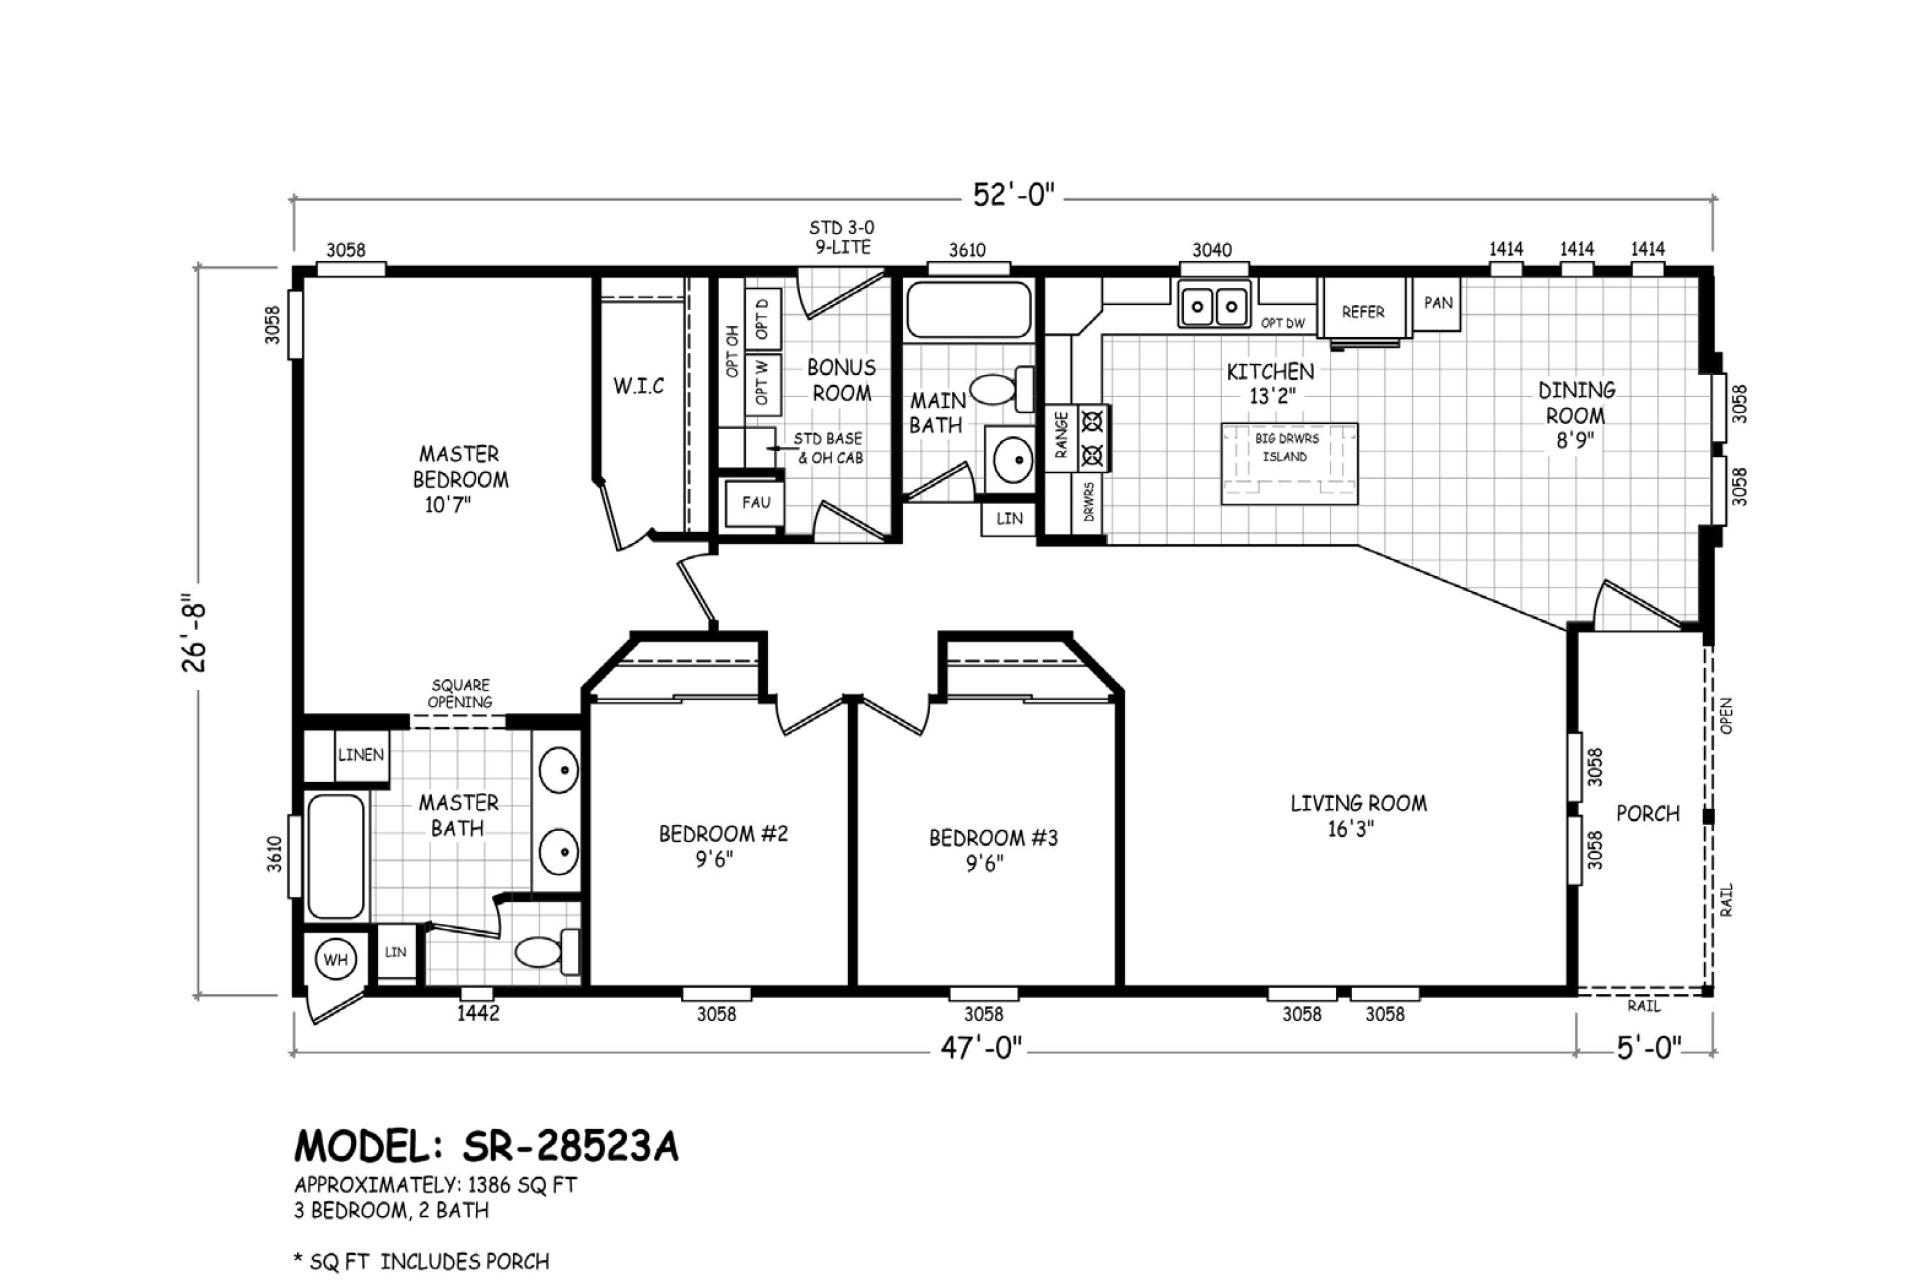 Sedona Ridge - SR-28523A